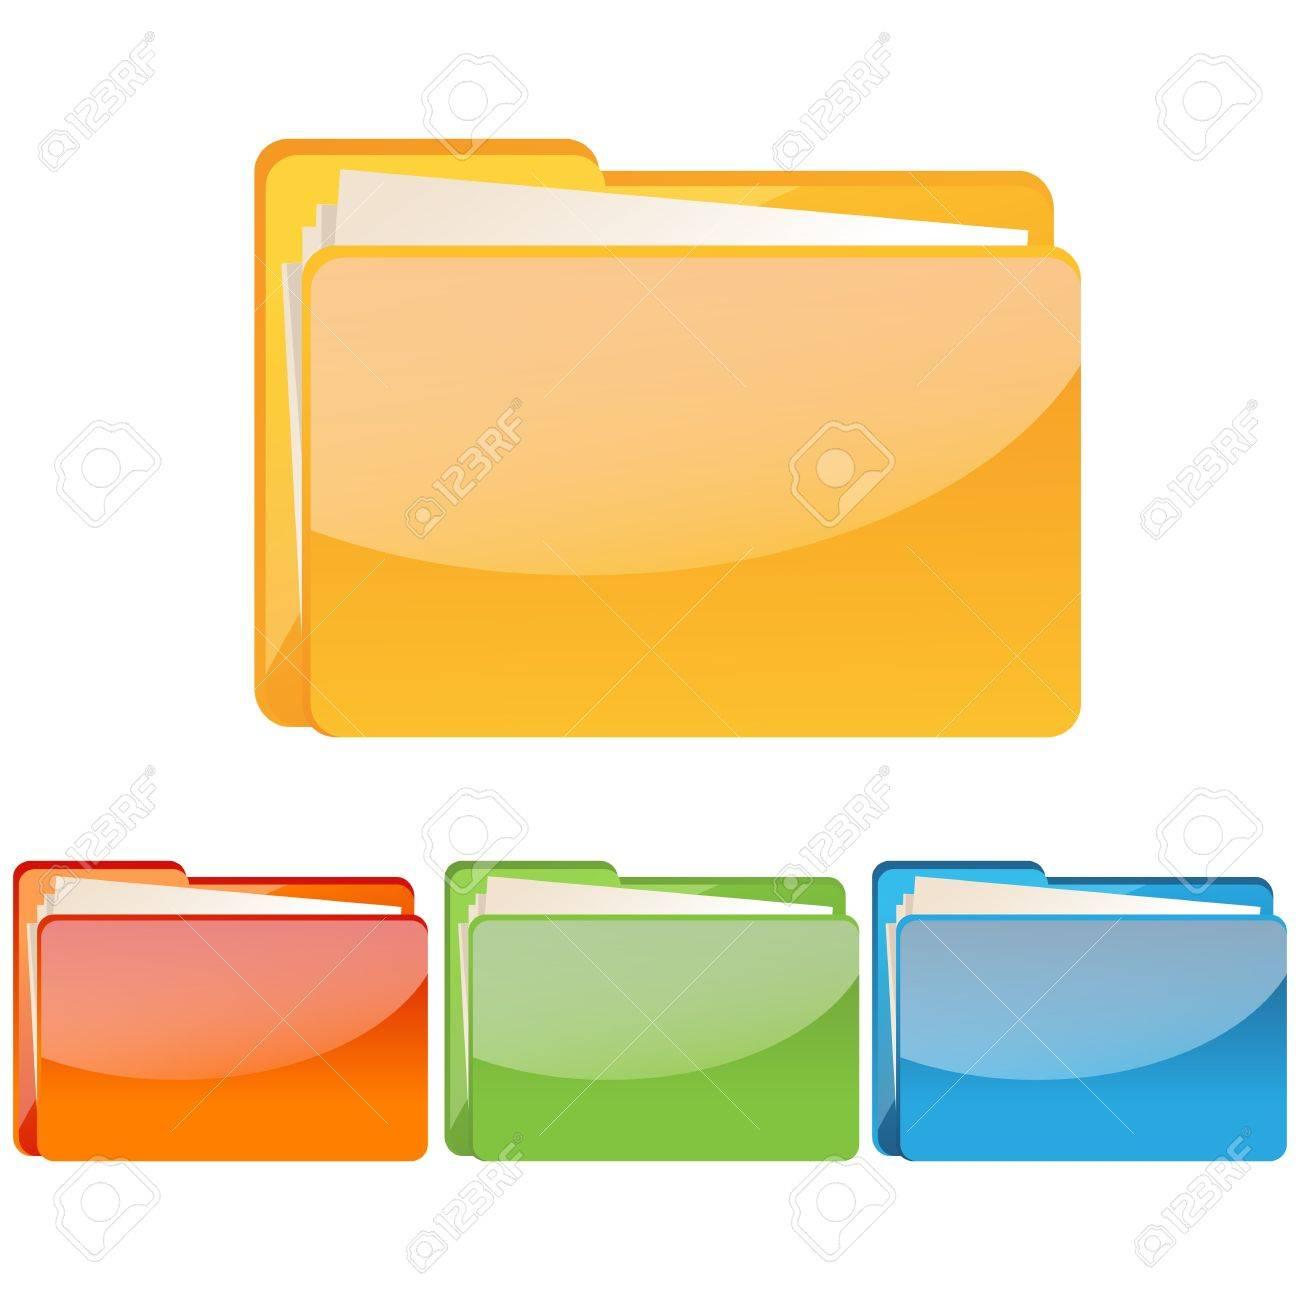 illustration of set of colorful folder icon on an isolated background Stock Illustration - 8112412